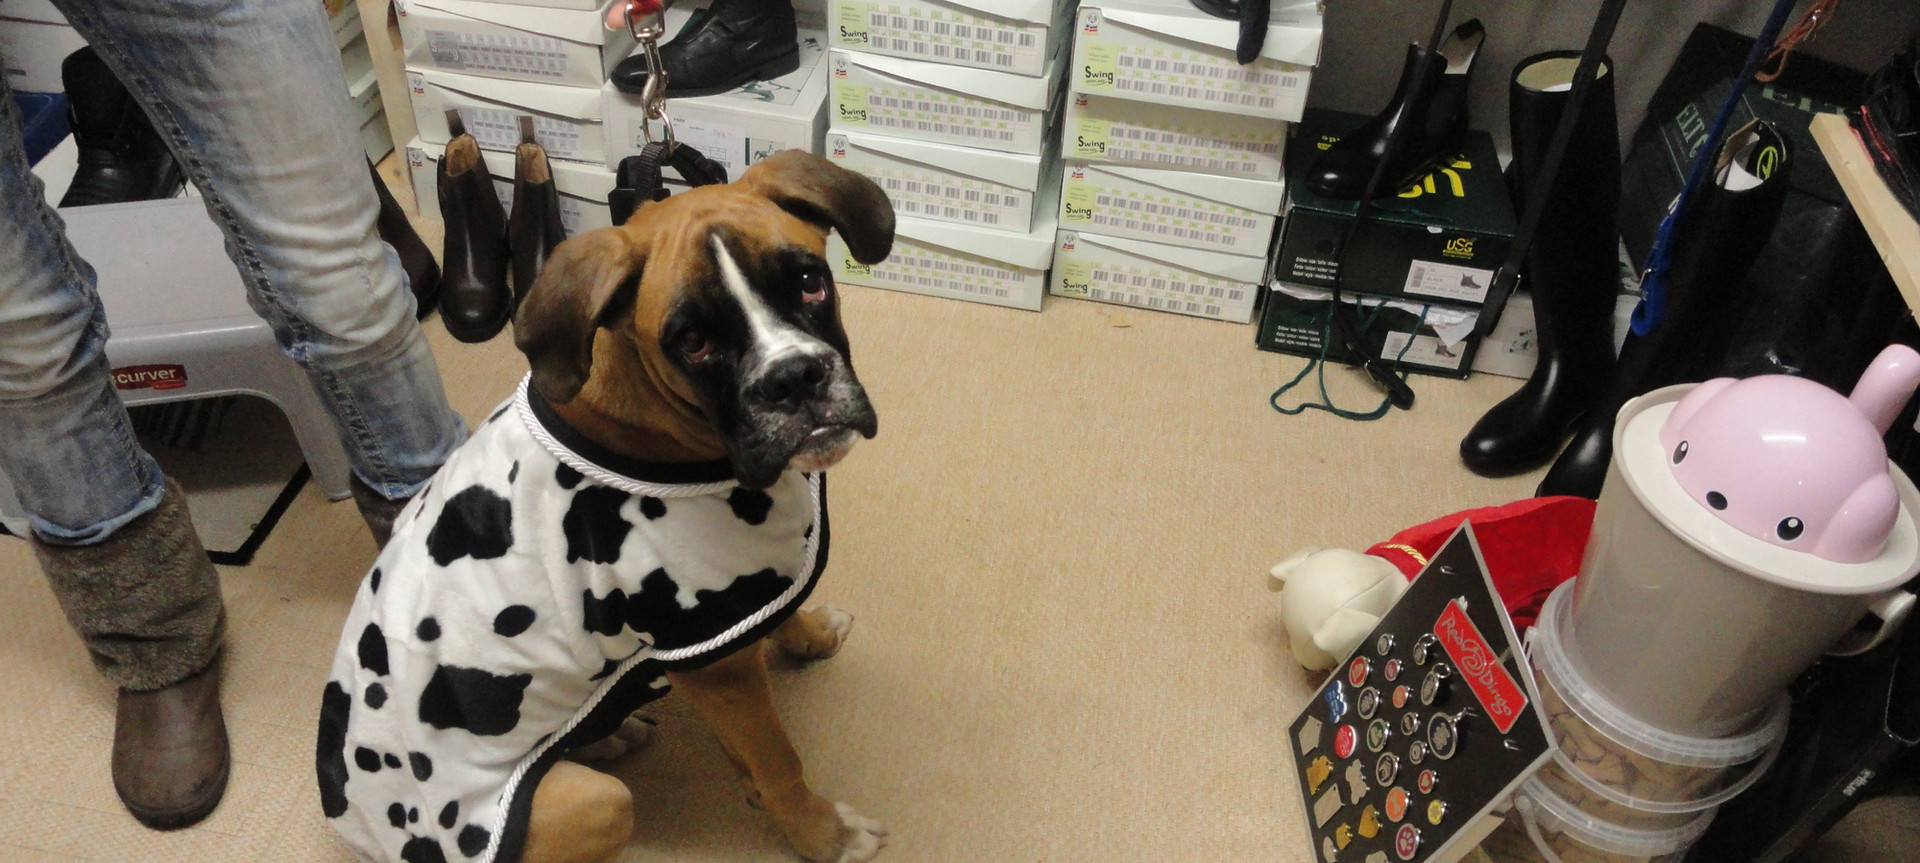 Hundemantel Dalmatiner.JPG